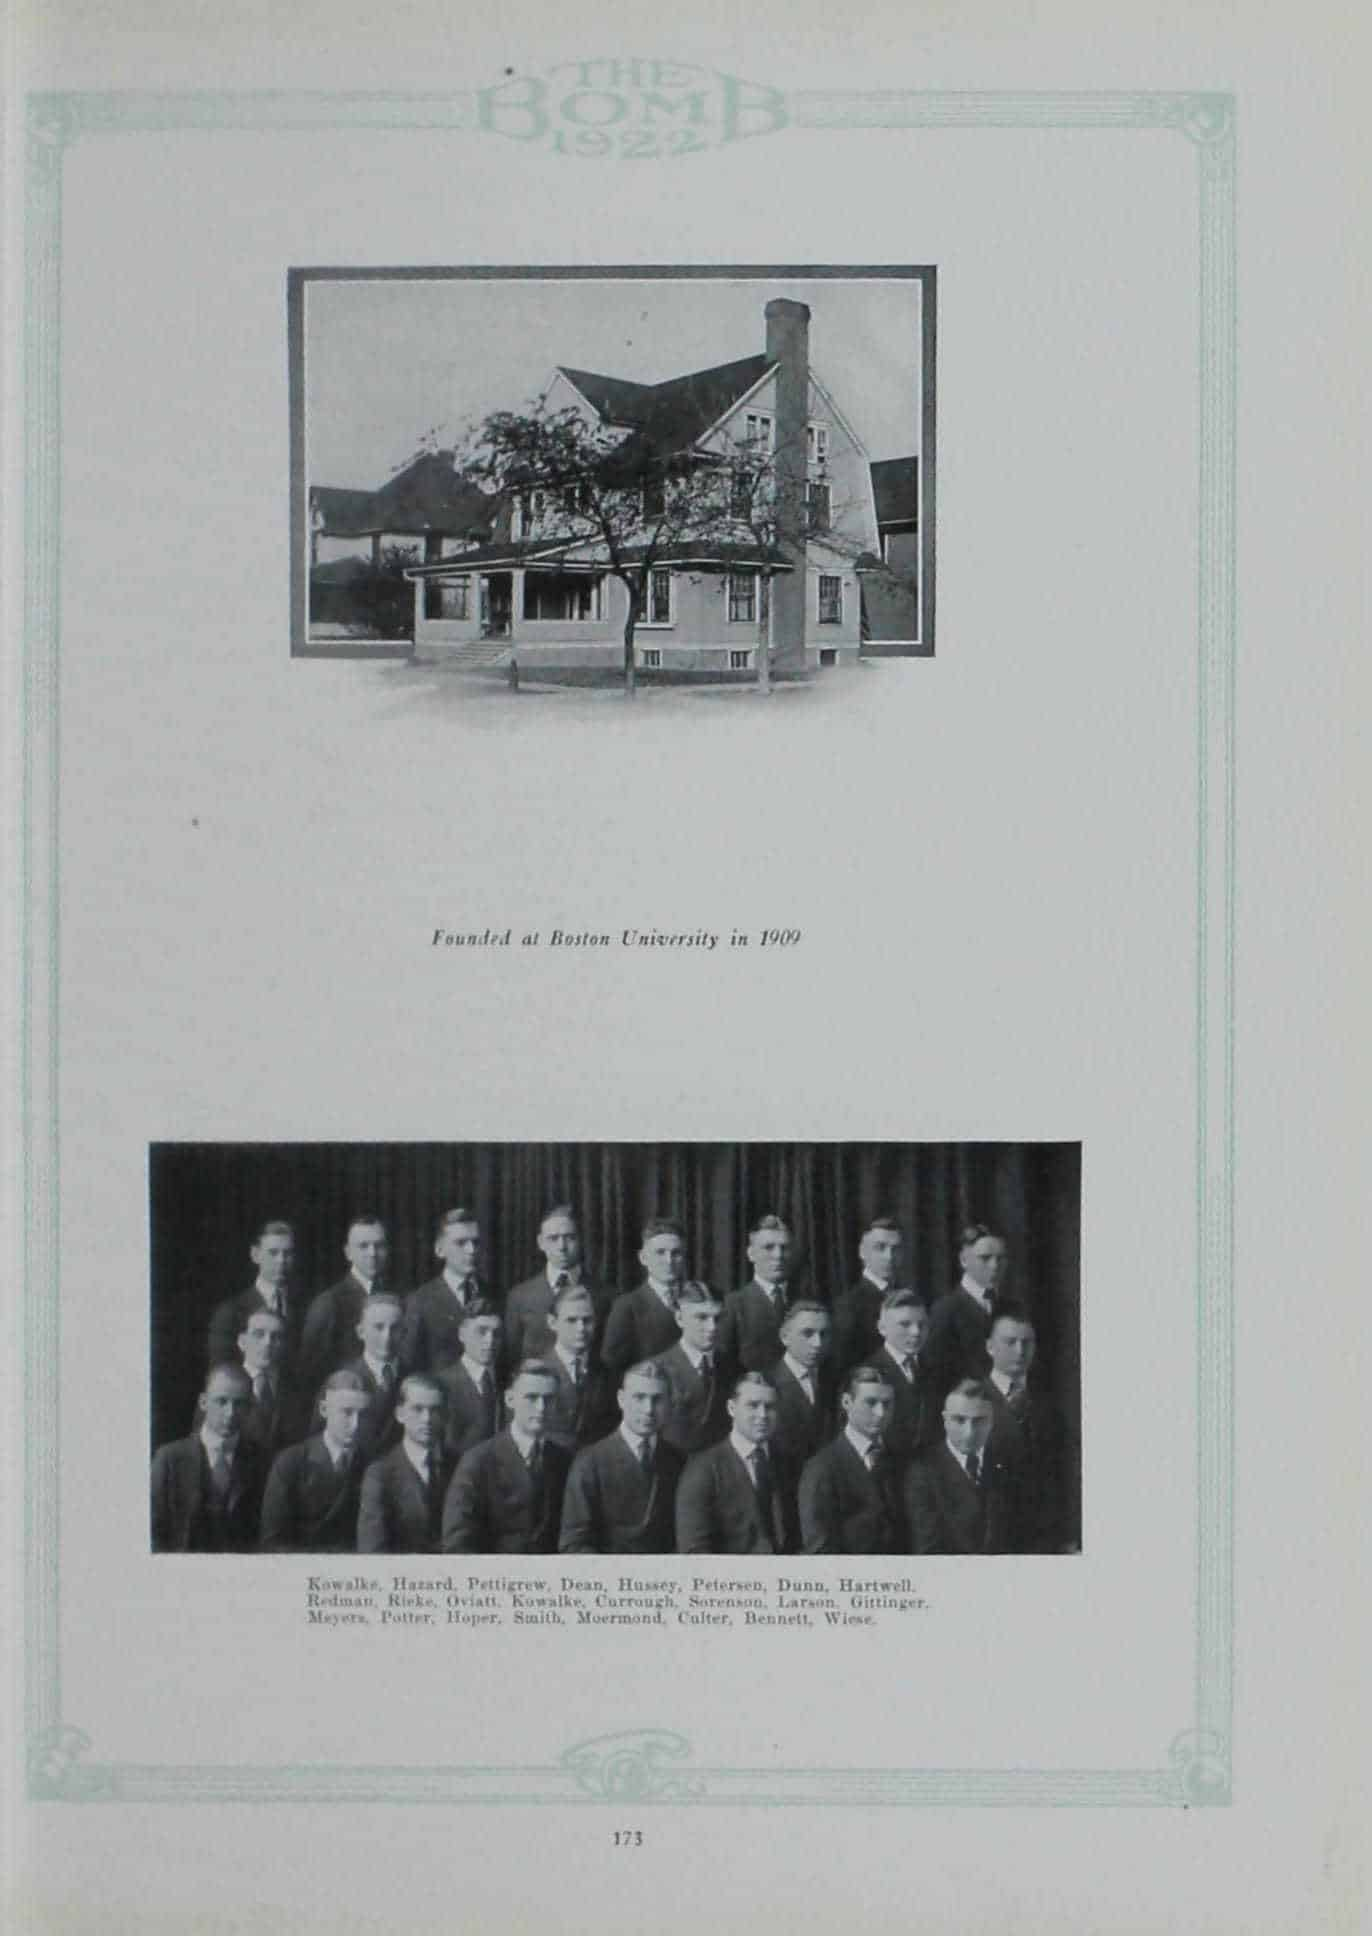 1921 Lambda Chi Alpha